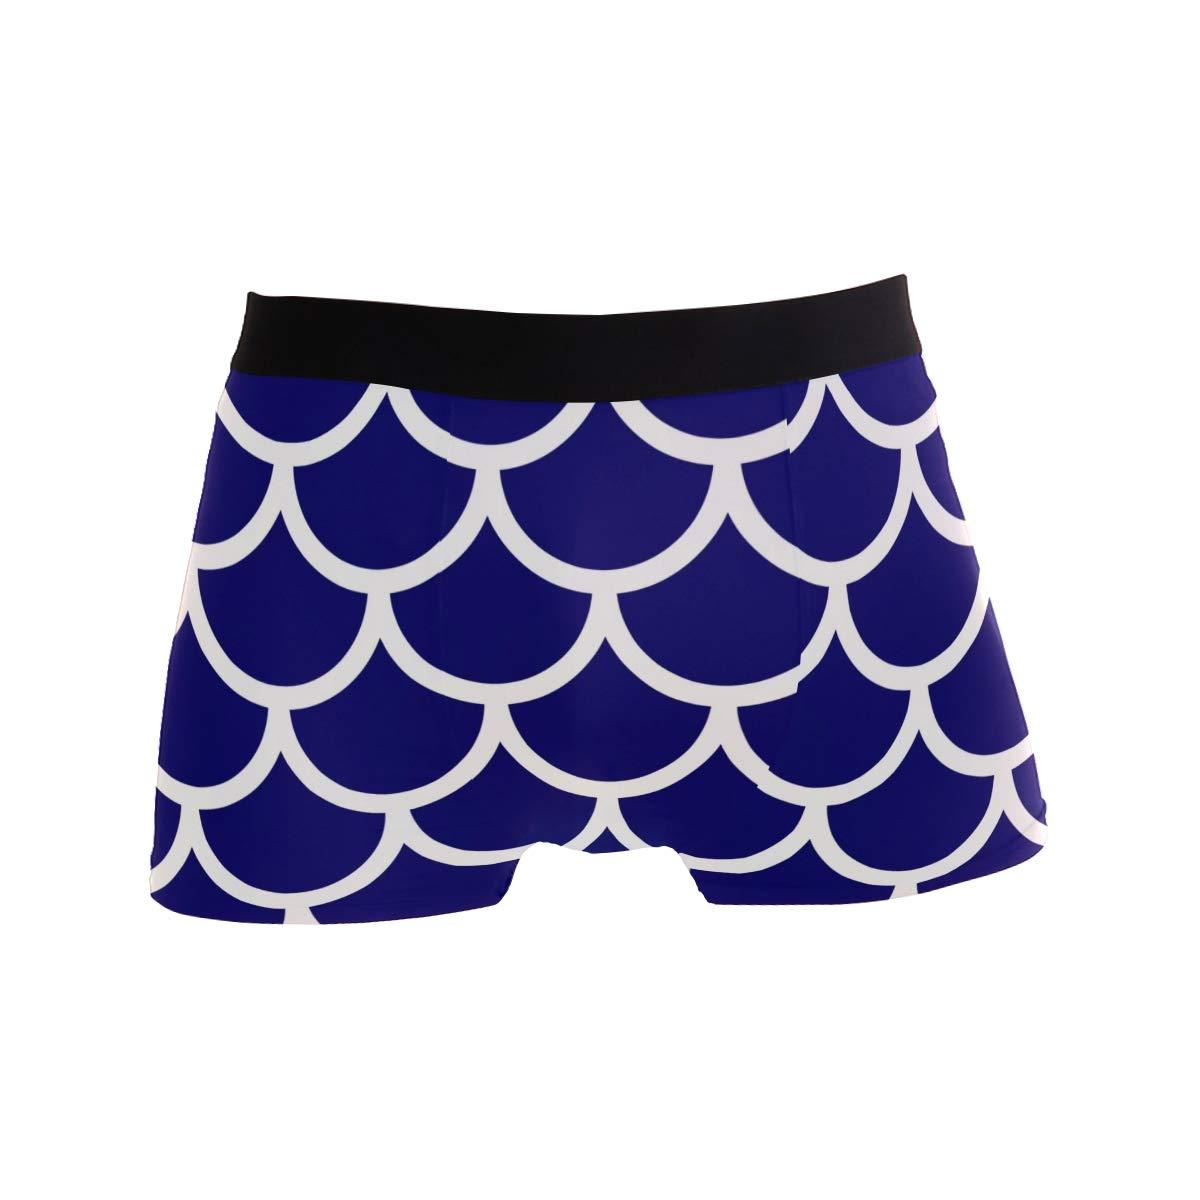 YYZZH Dark Blue Mermaid Scales Fish Scales Japanese Traditional Ornament Mens Boxer Briefs Man Underwear